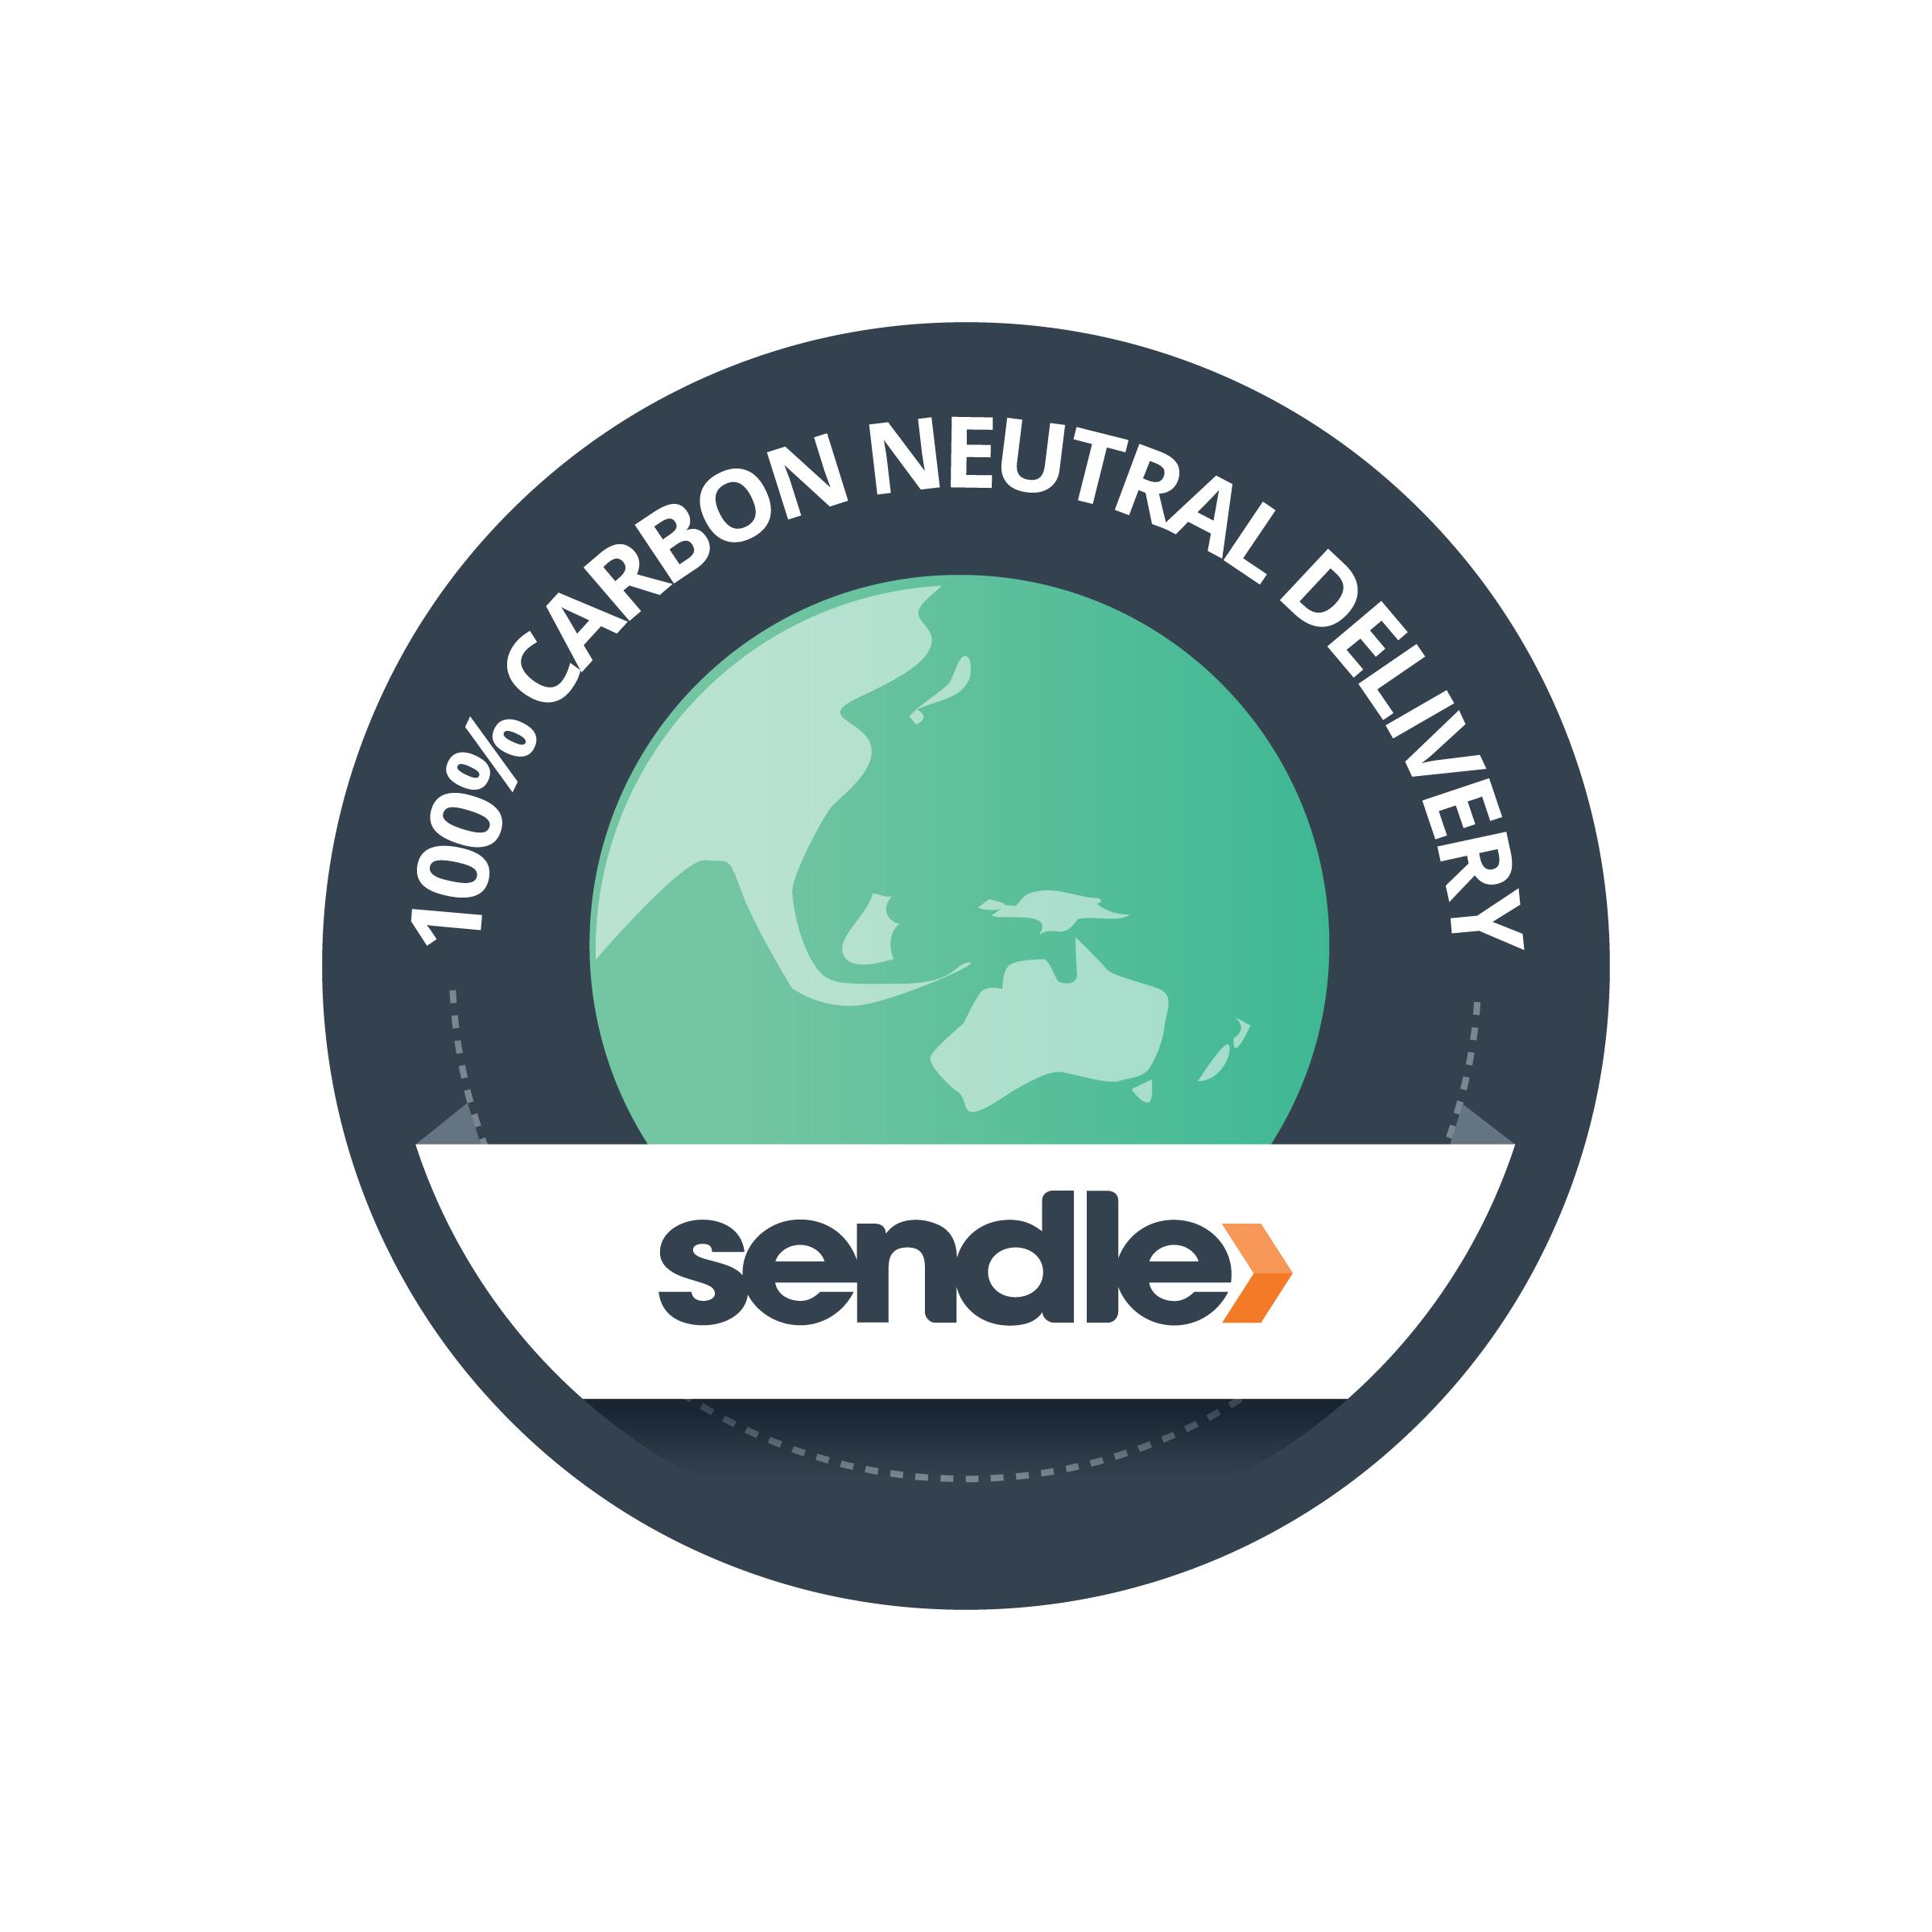 logo-sendle-carbonnetral-midnight-2x.jpg